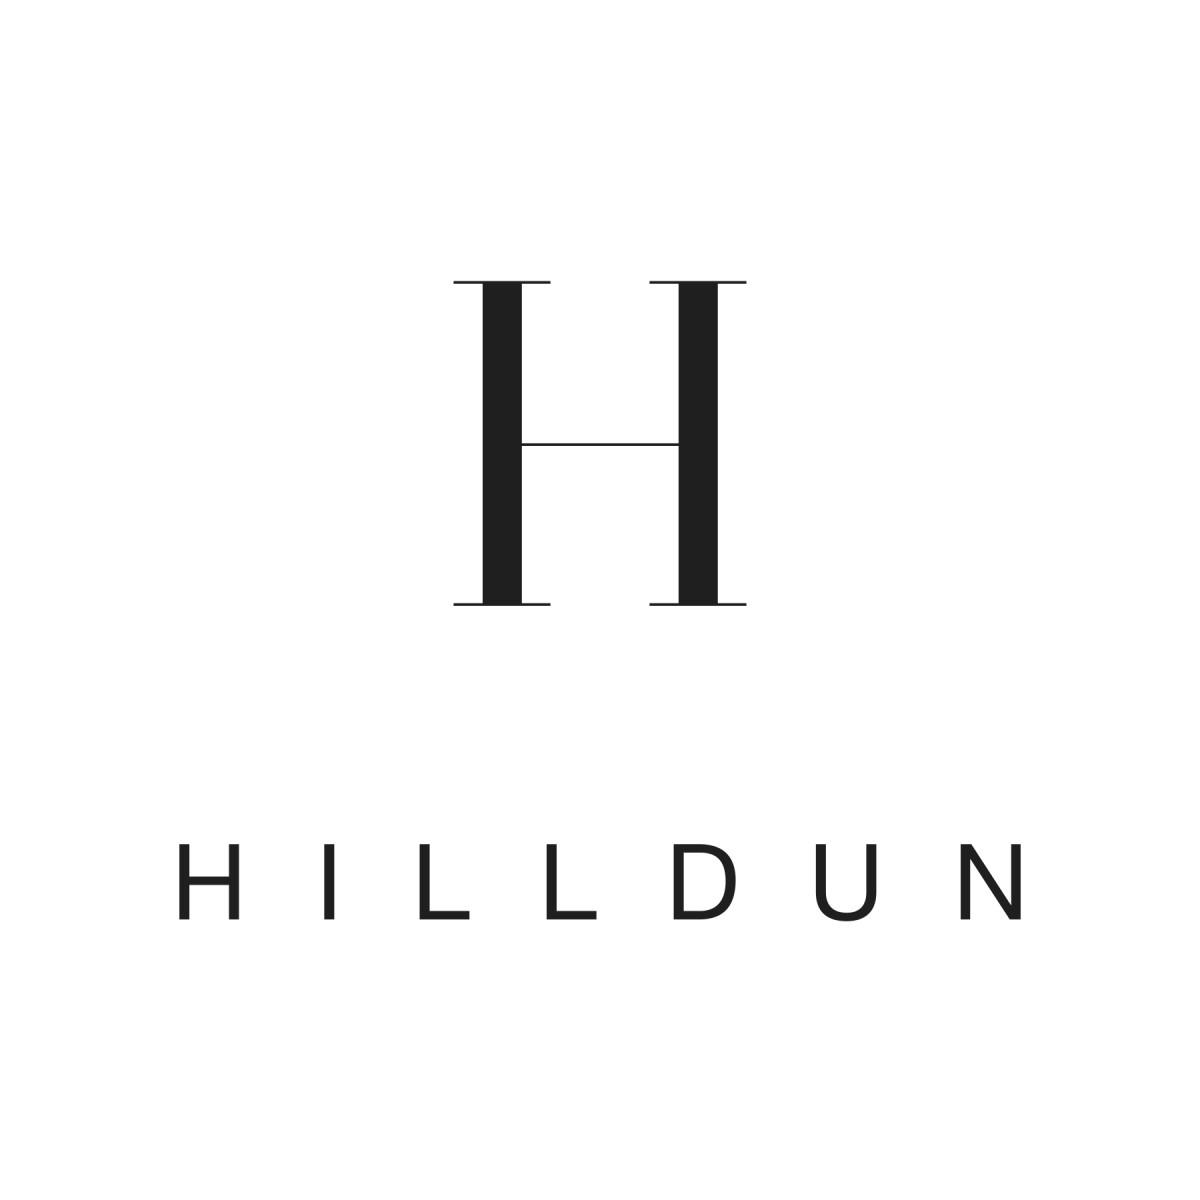 Hilldun_Lockup_on_White_Large.jpg